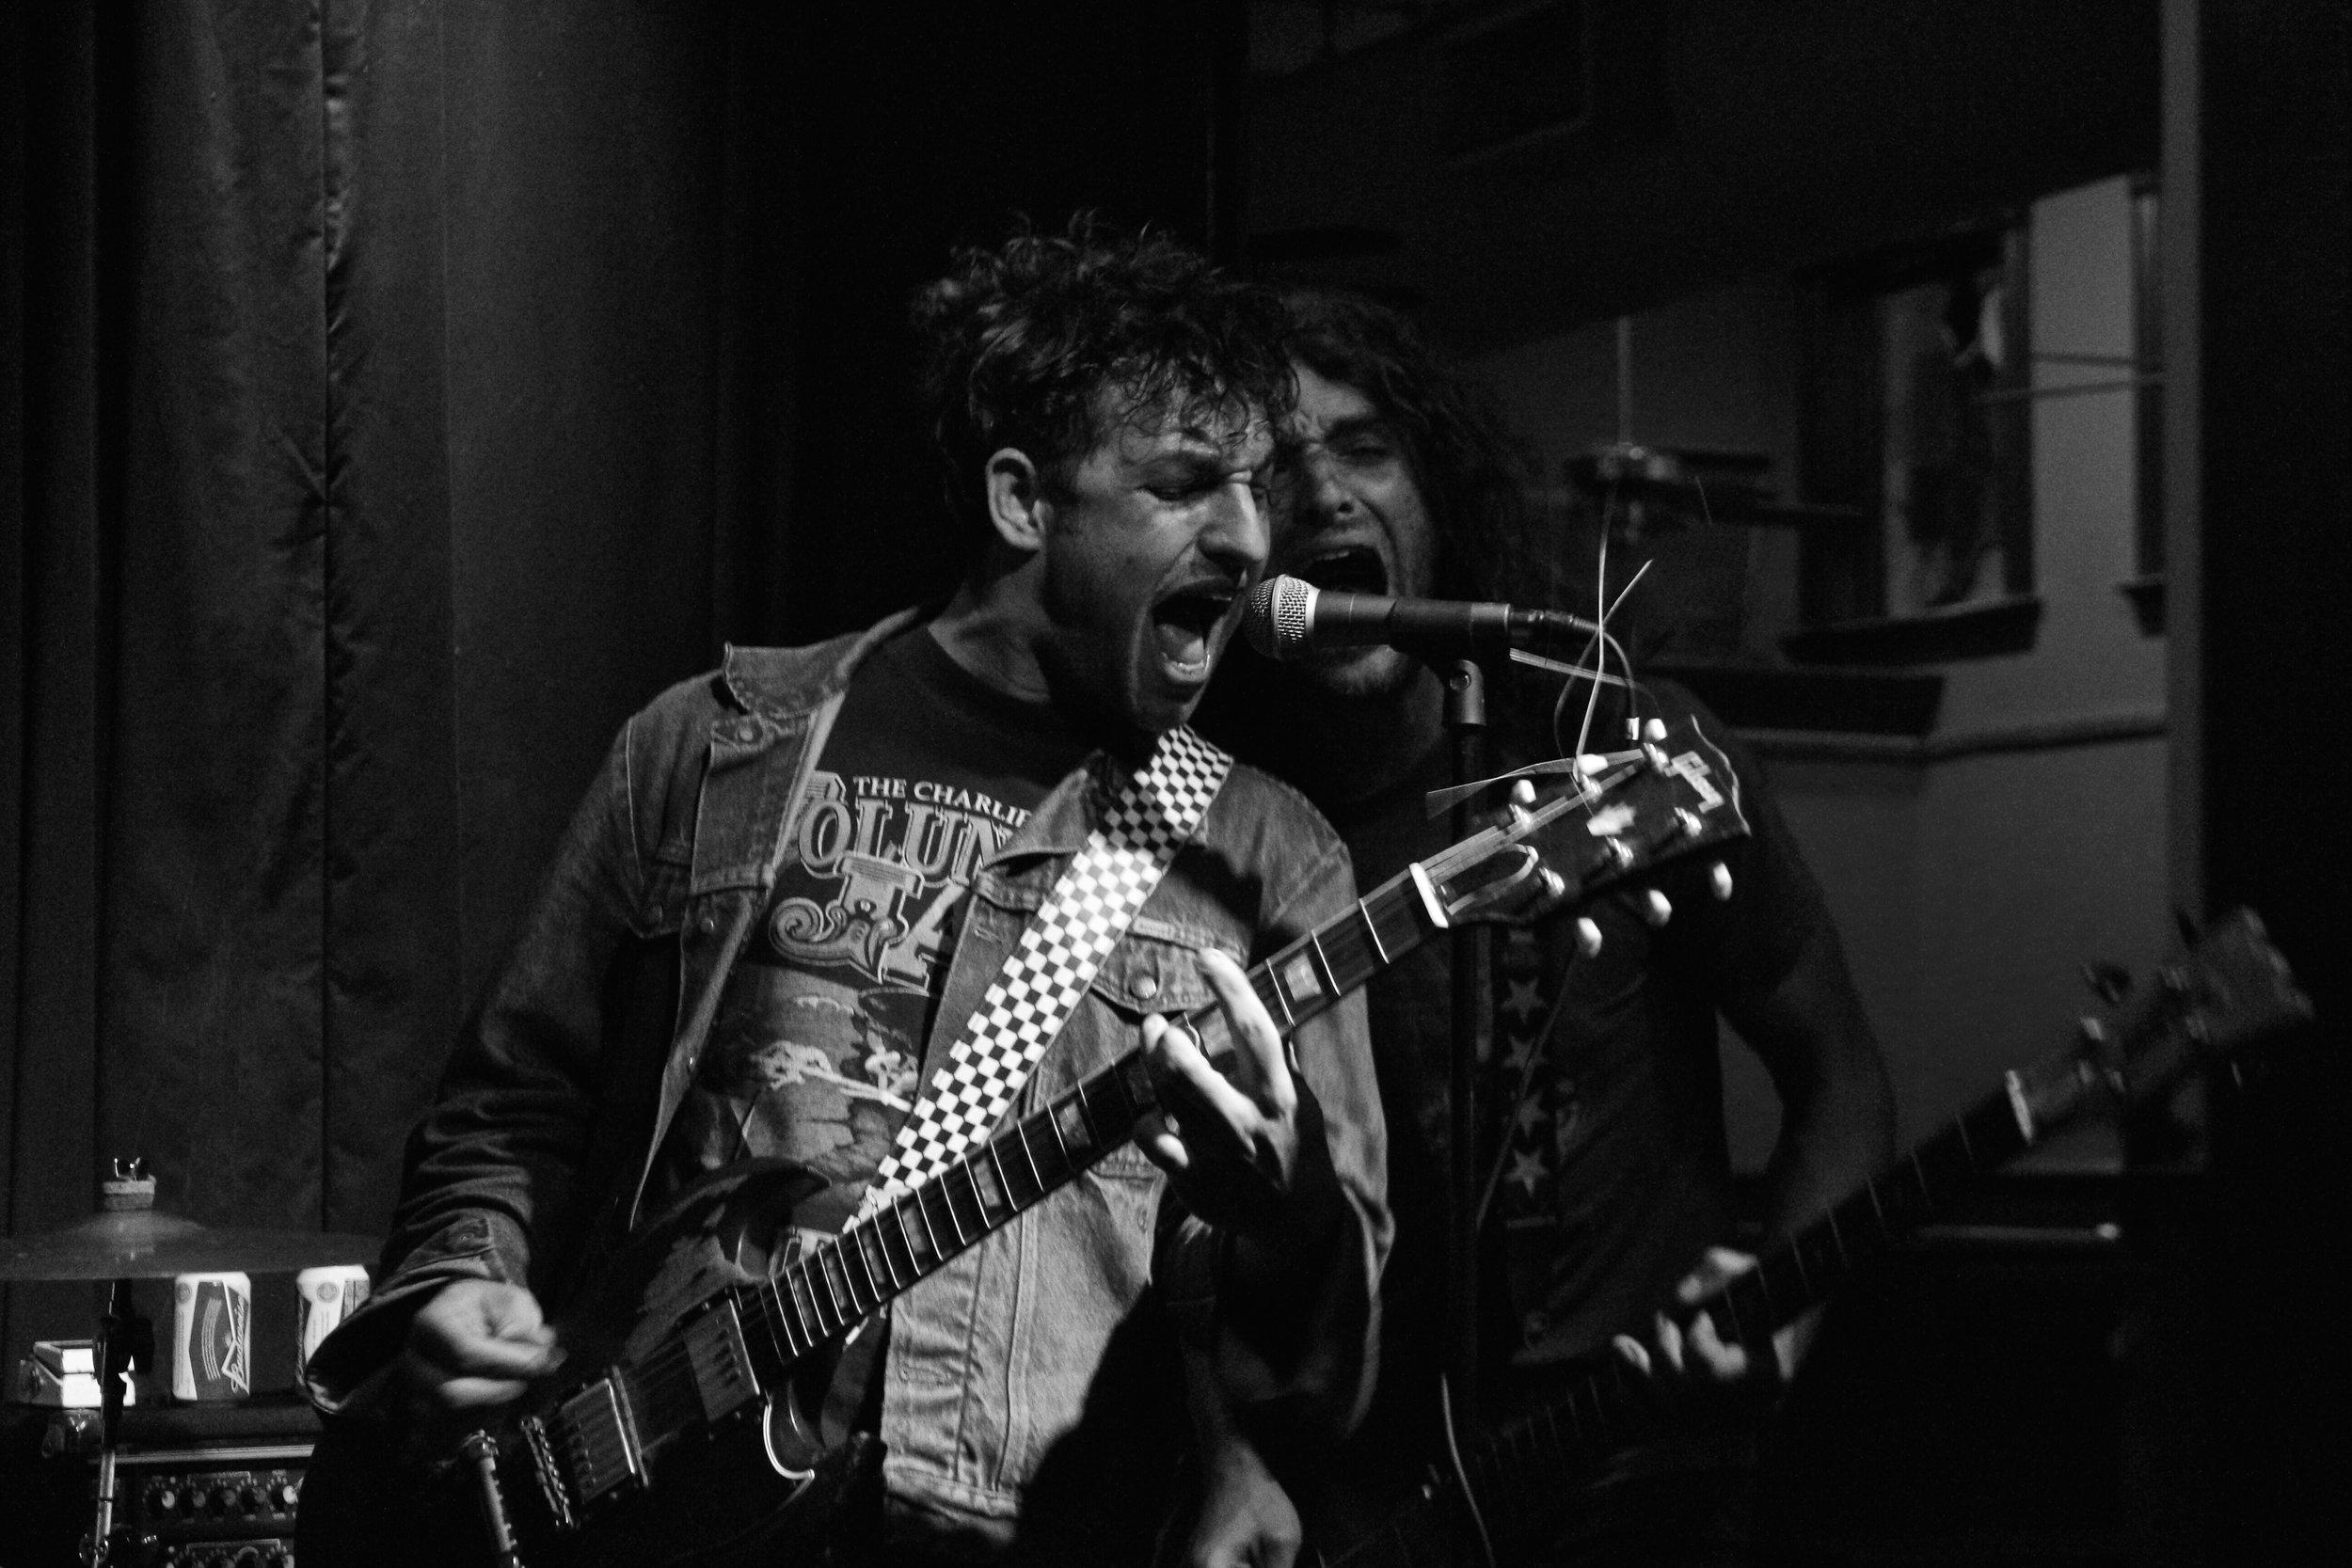 Lee Bains III & the Glory Fires. MOTR Pub, Cincinnati, OH. 2015.